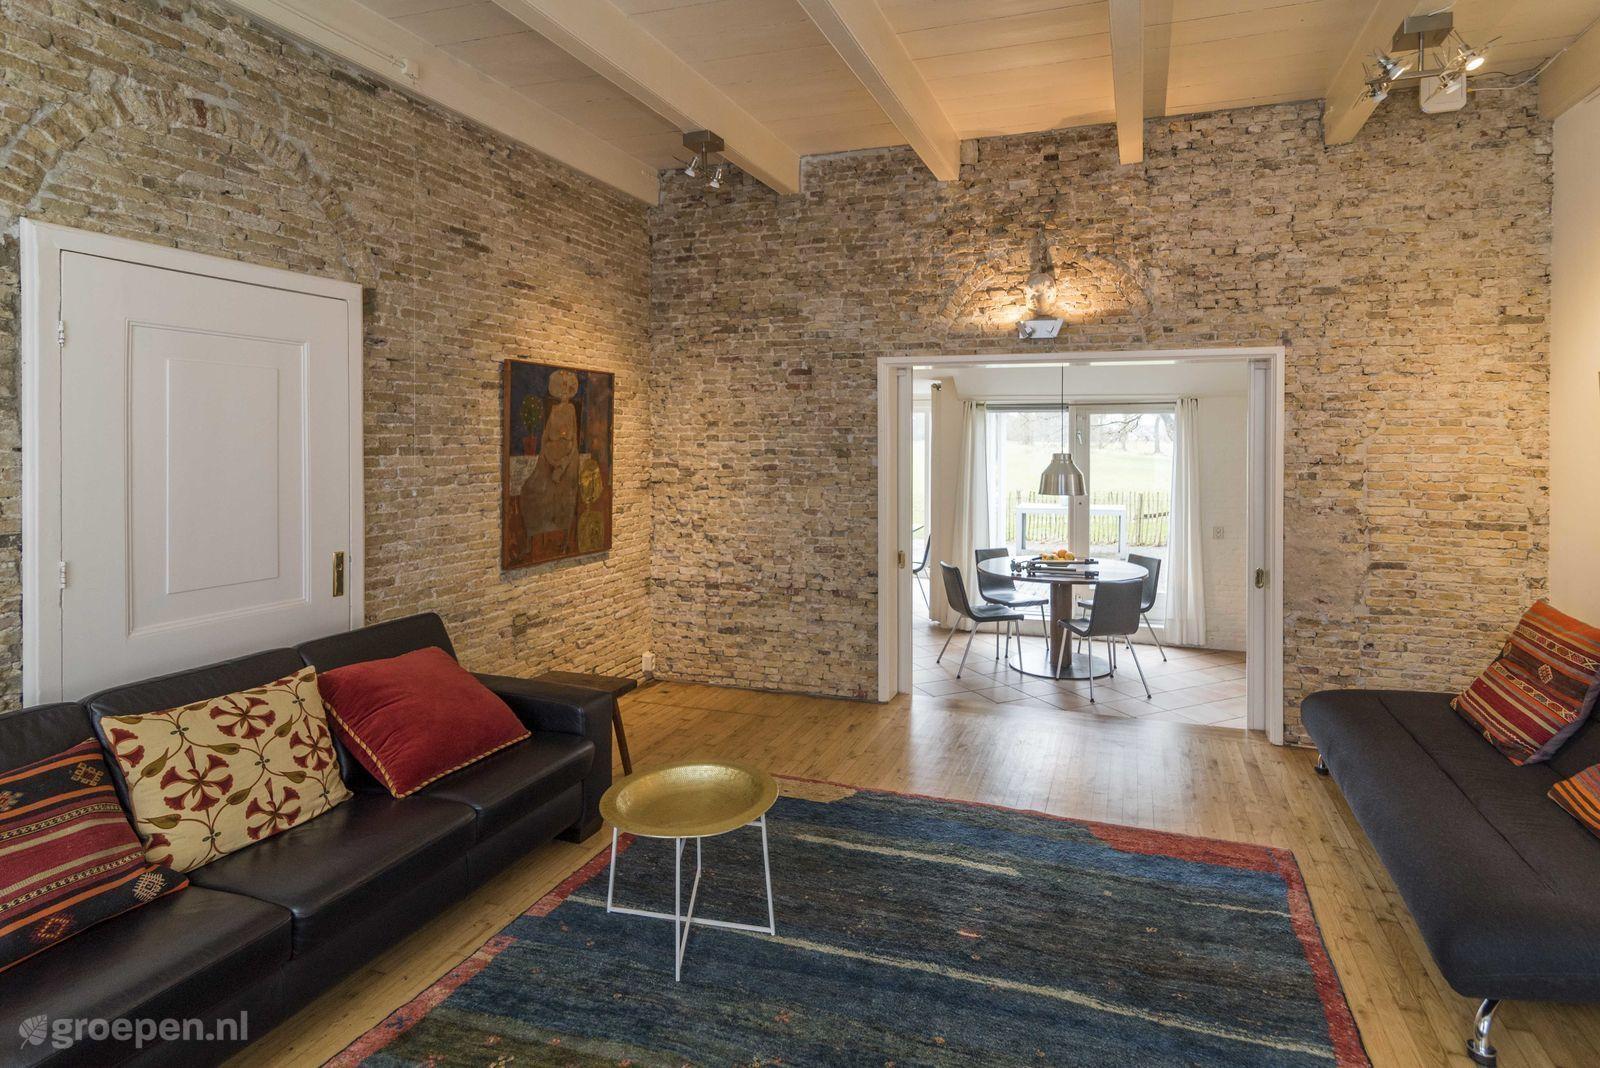 Group accommodation Wijnjewoude